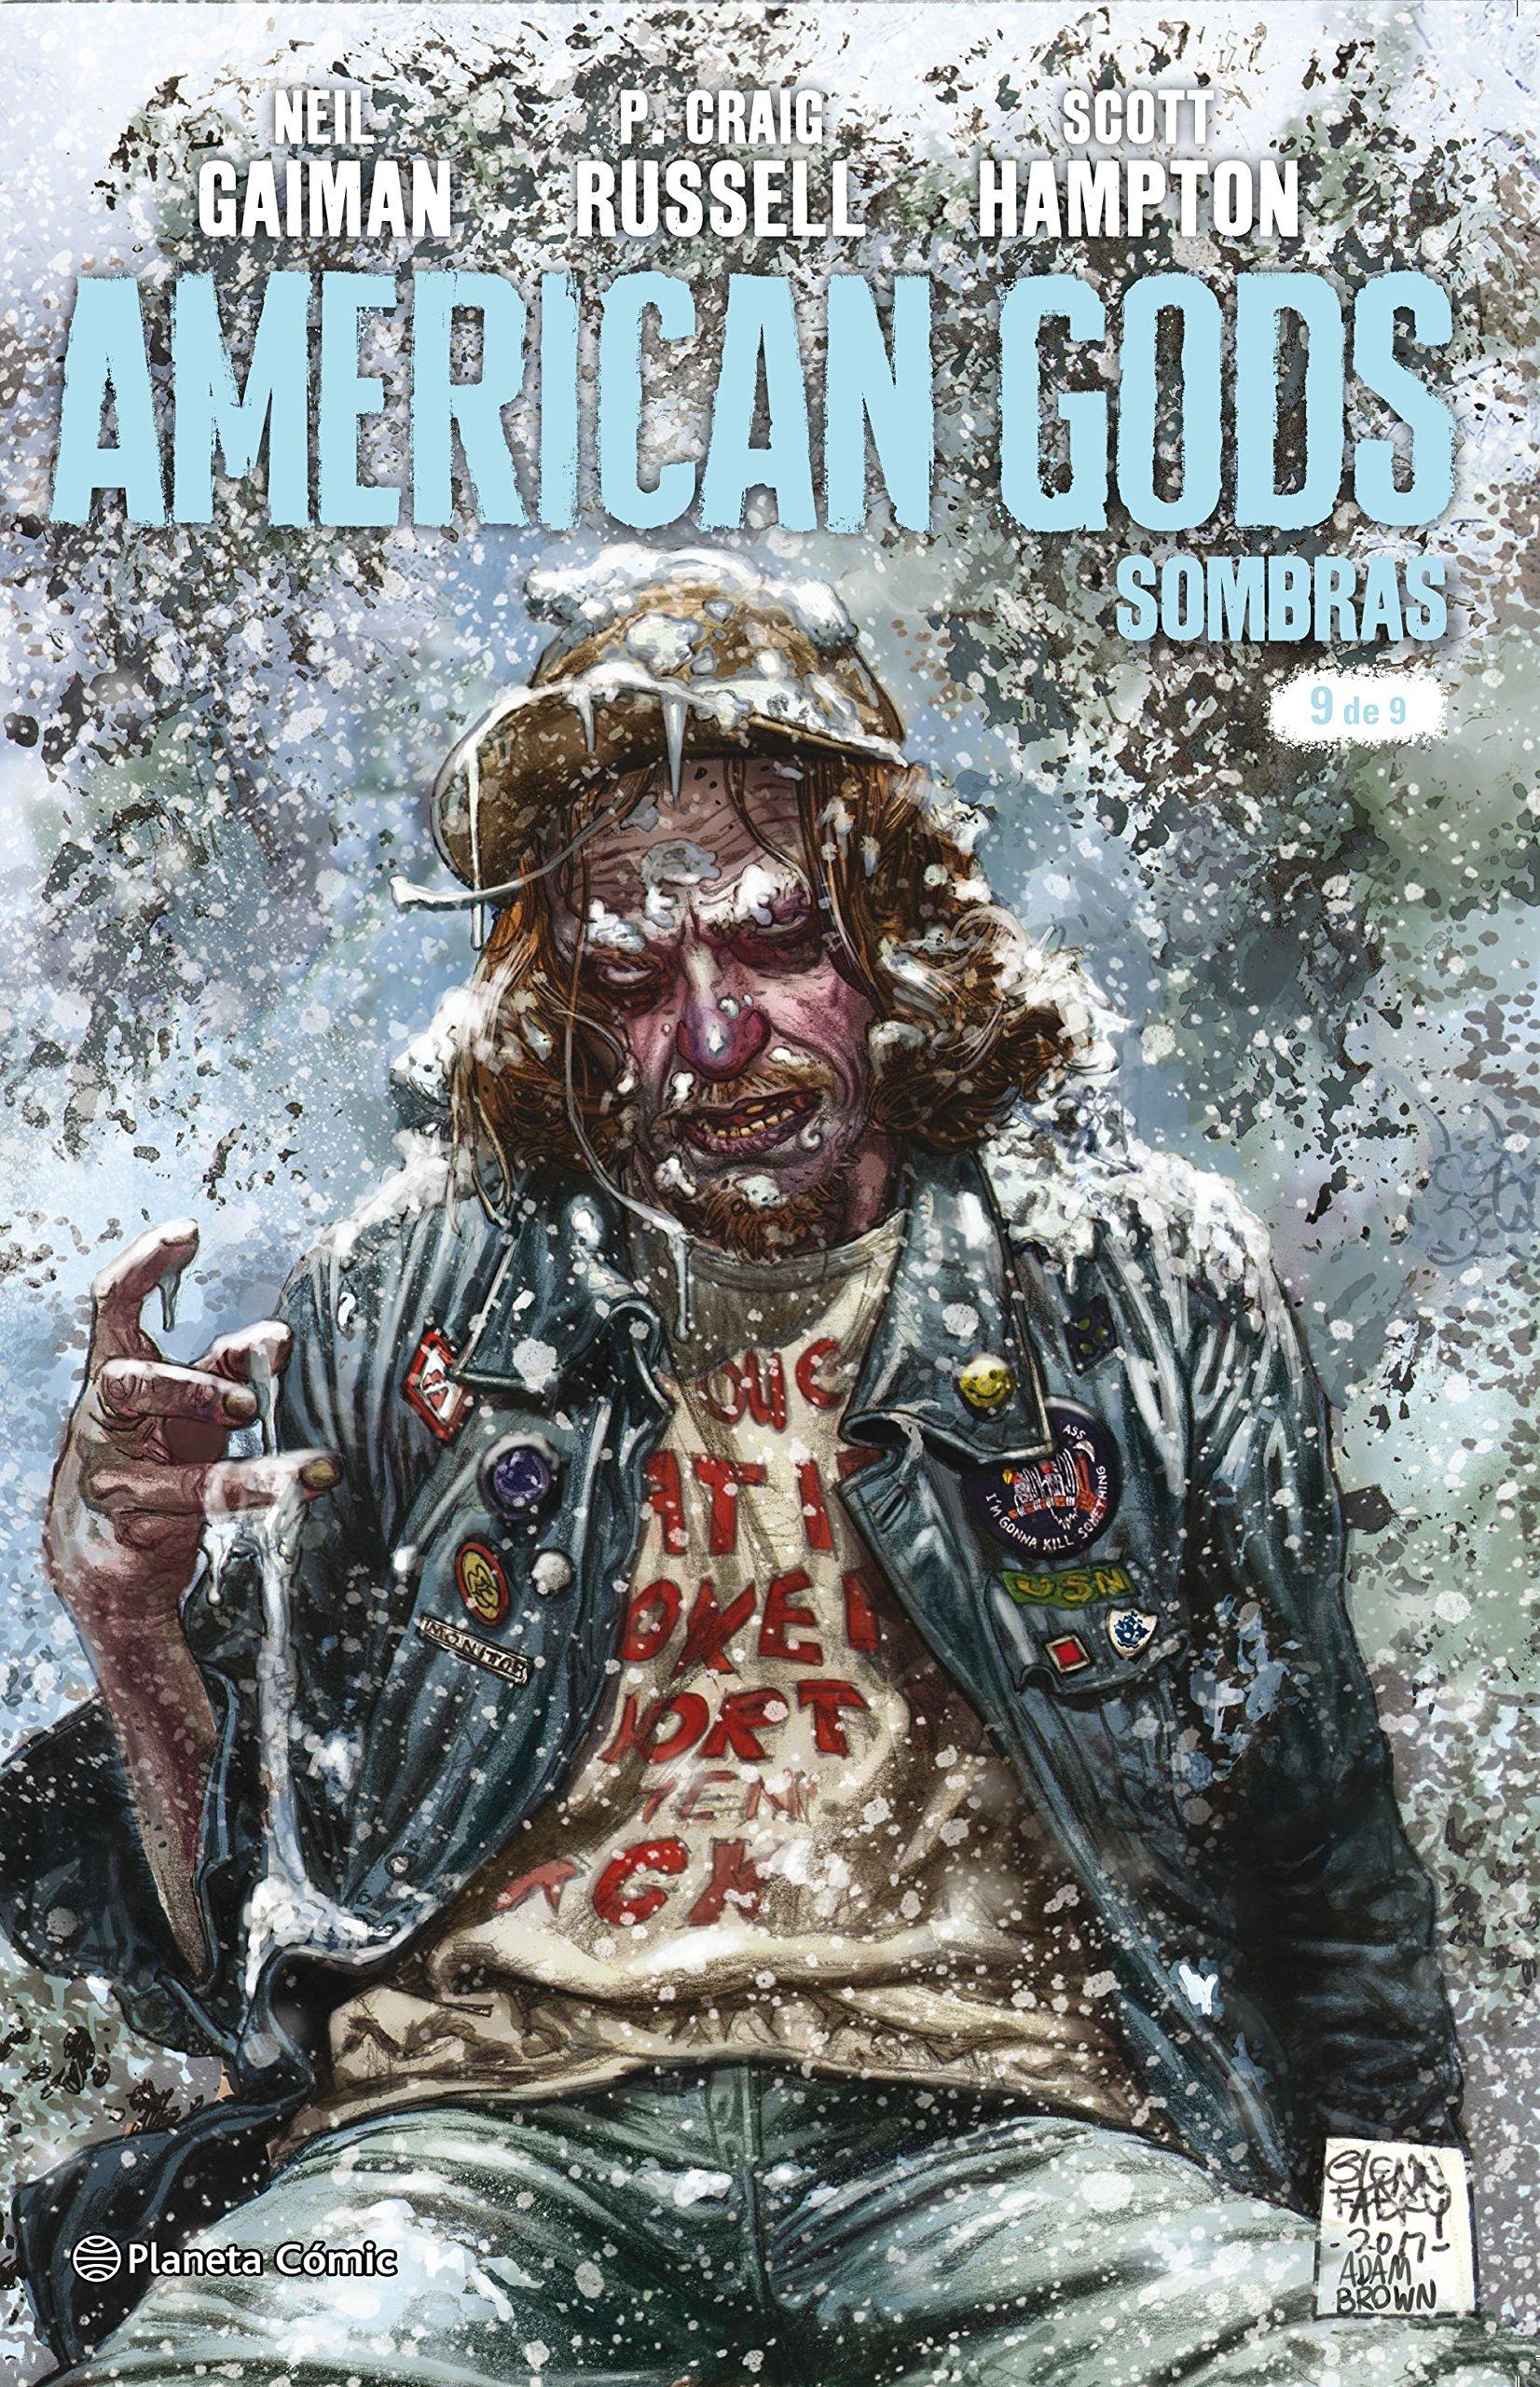 American Gods Sombras nº 09/09 (Independientes USA) Tapa blanda – 2 oct 2018 NEil Gaiman Philip Craig Russell Scott Hampton Diego de los Santos